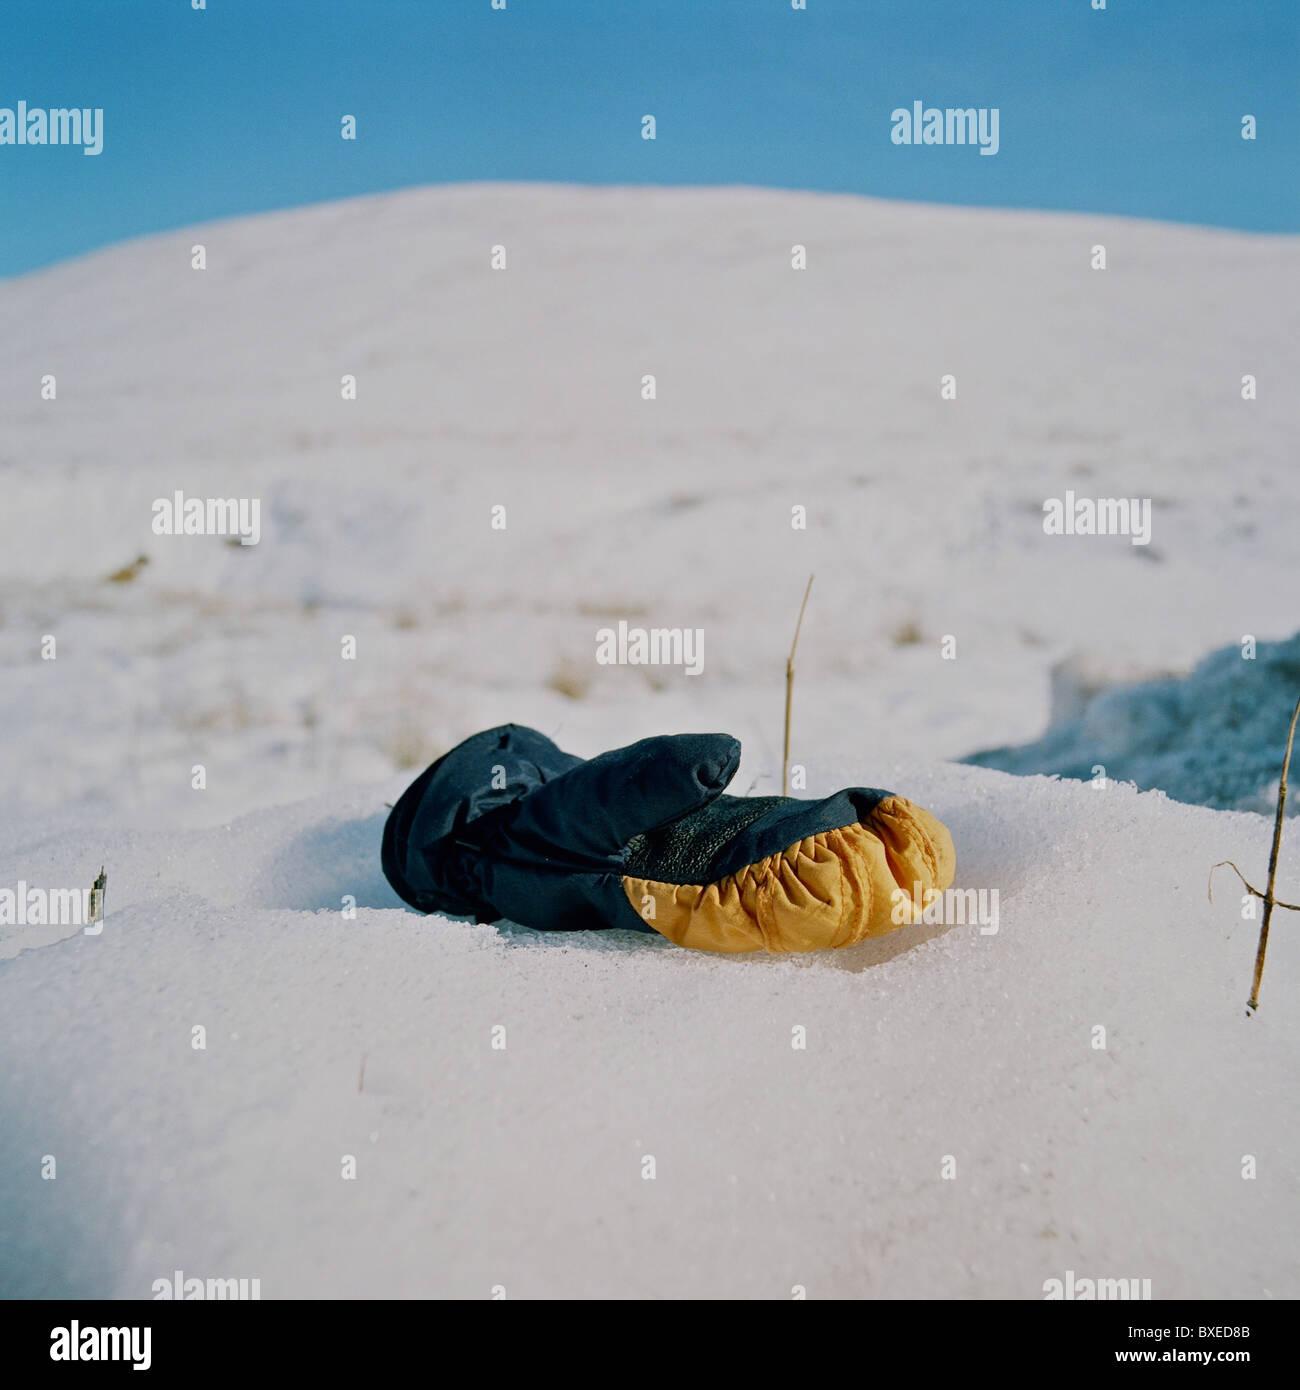 Verlorenen Handschuh im Schnee. Stockbild